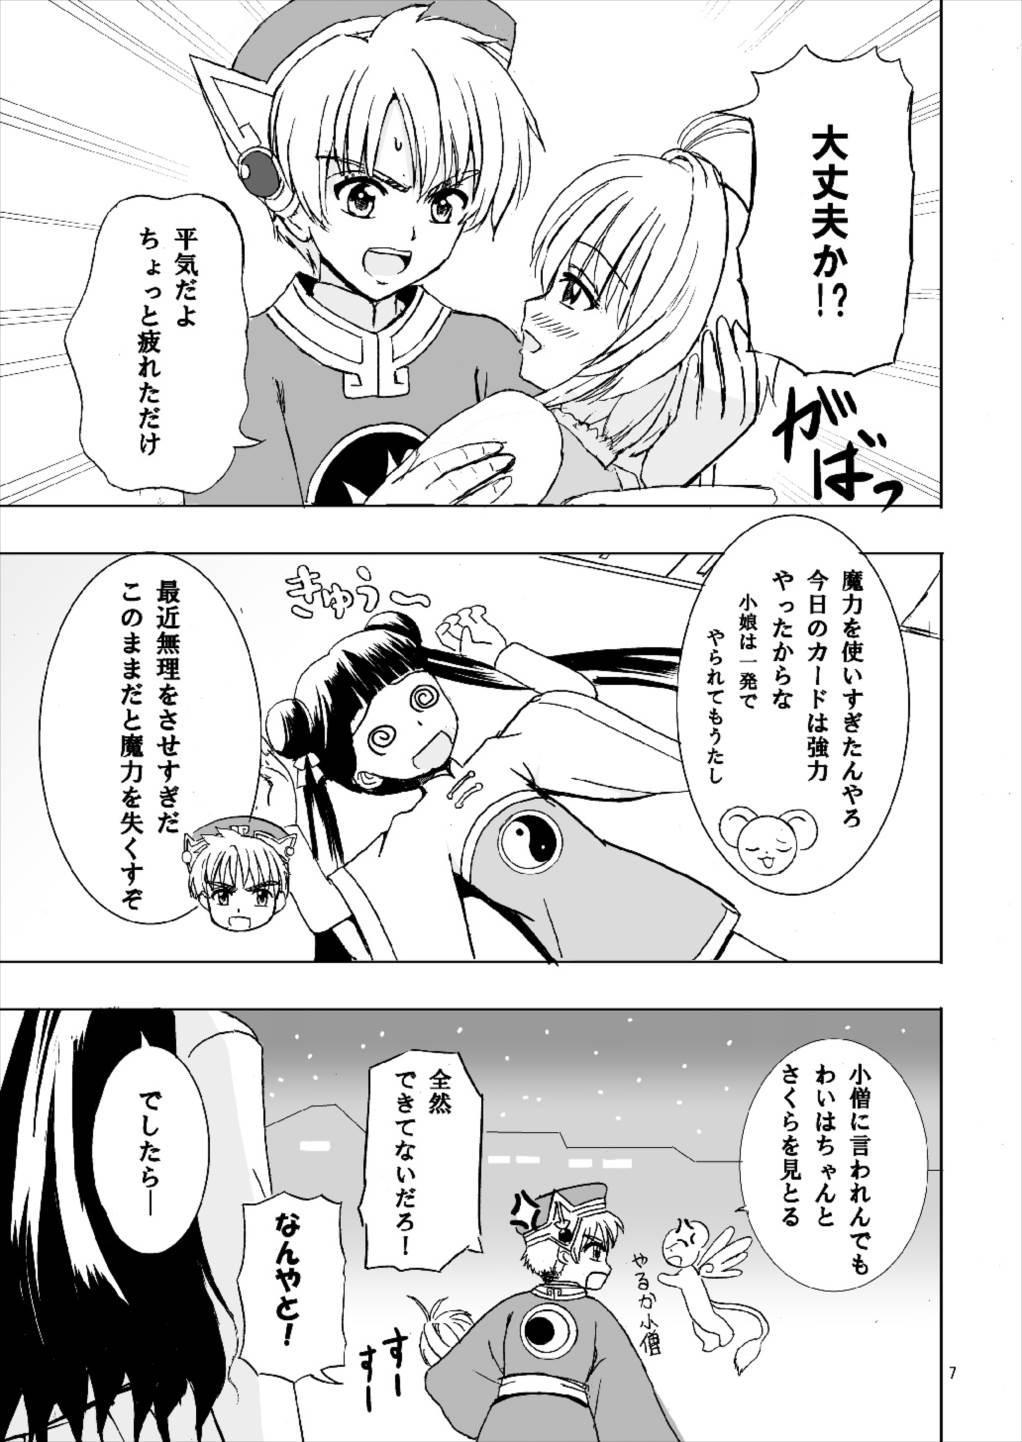 Sakura to Issho! 6